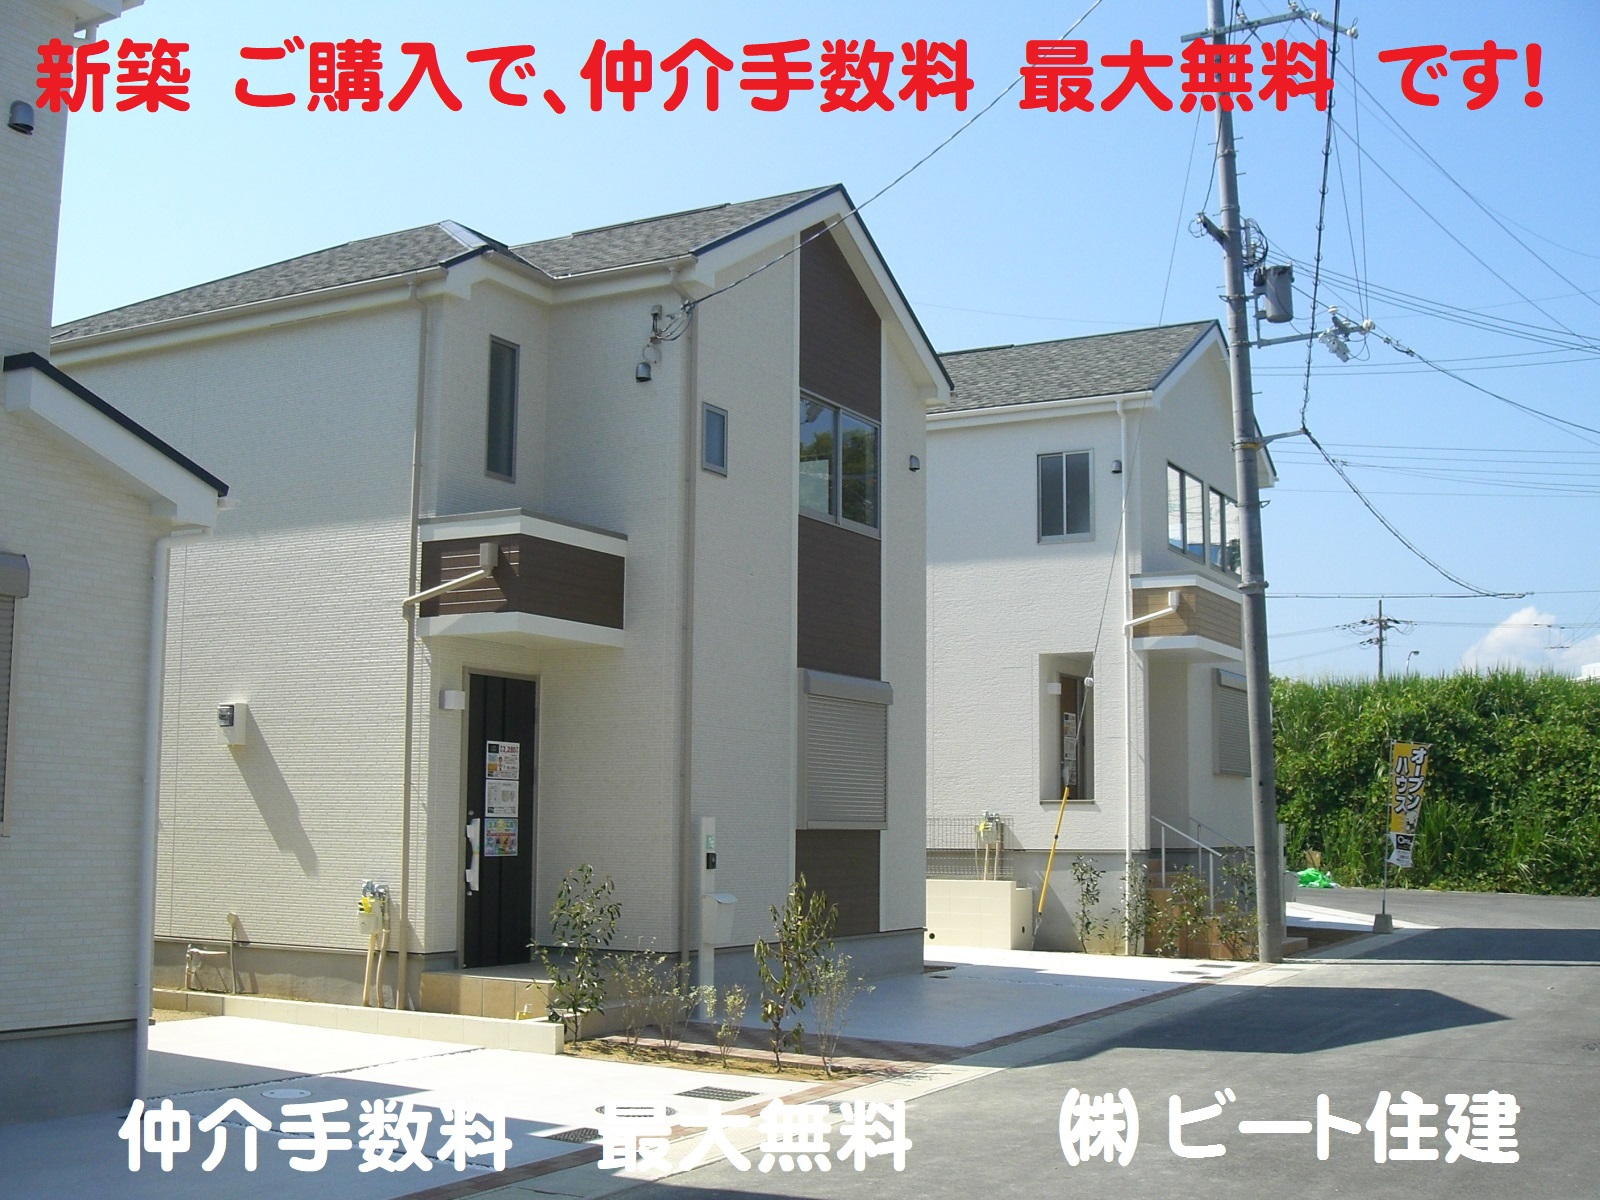 奈良県 新築一戸建て 上牧町 ビート住建 上牧町 新築 お買い得 仲介手数料 最大無料